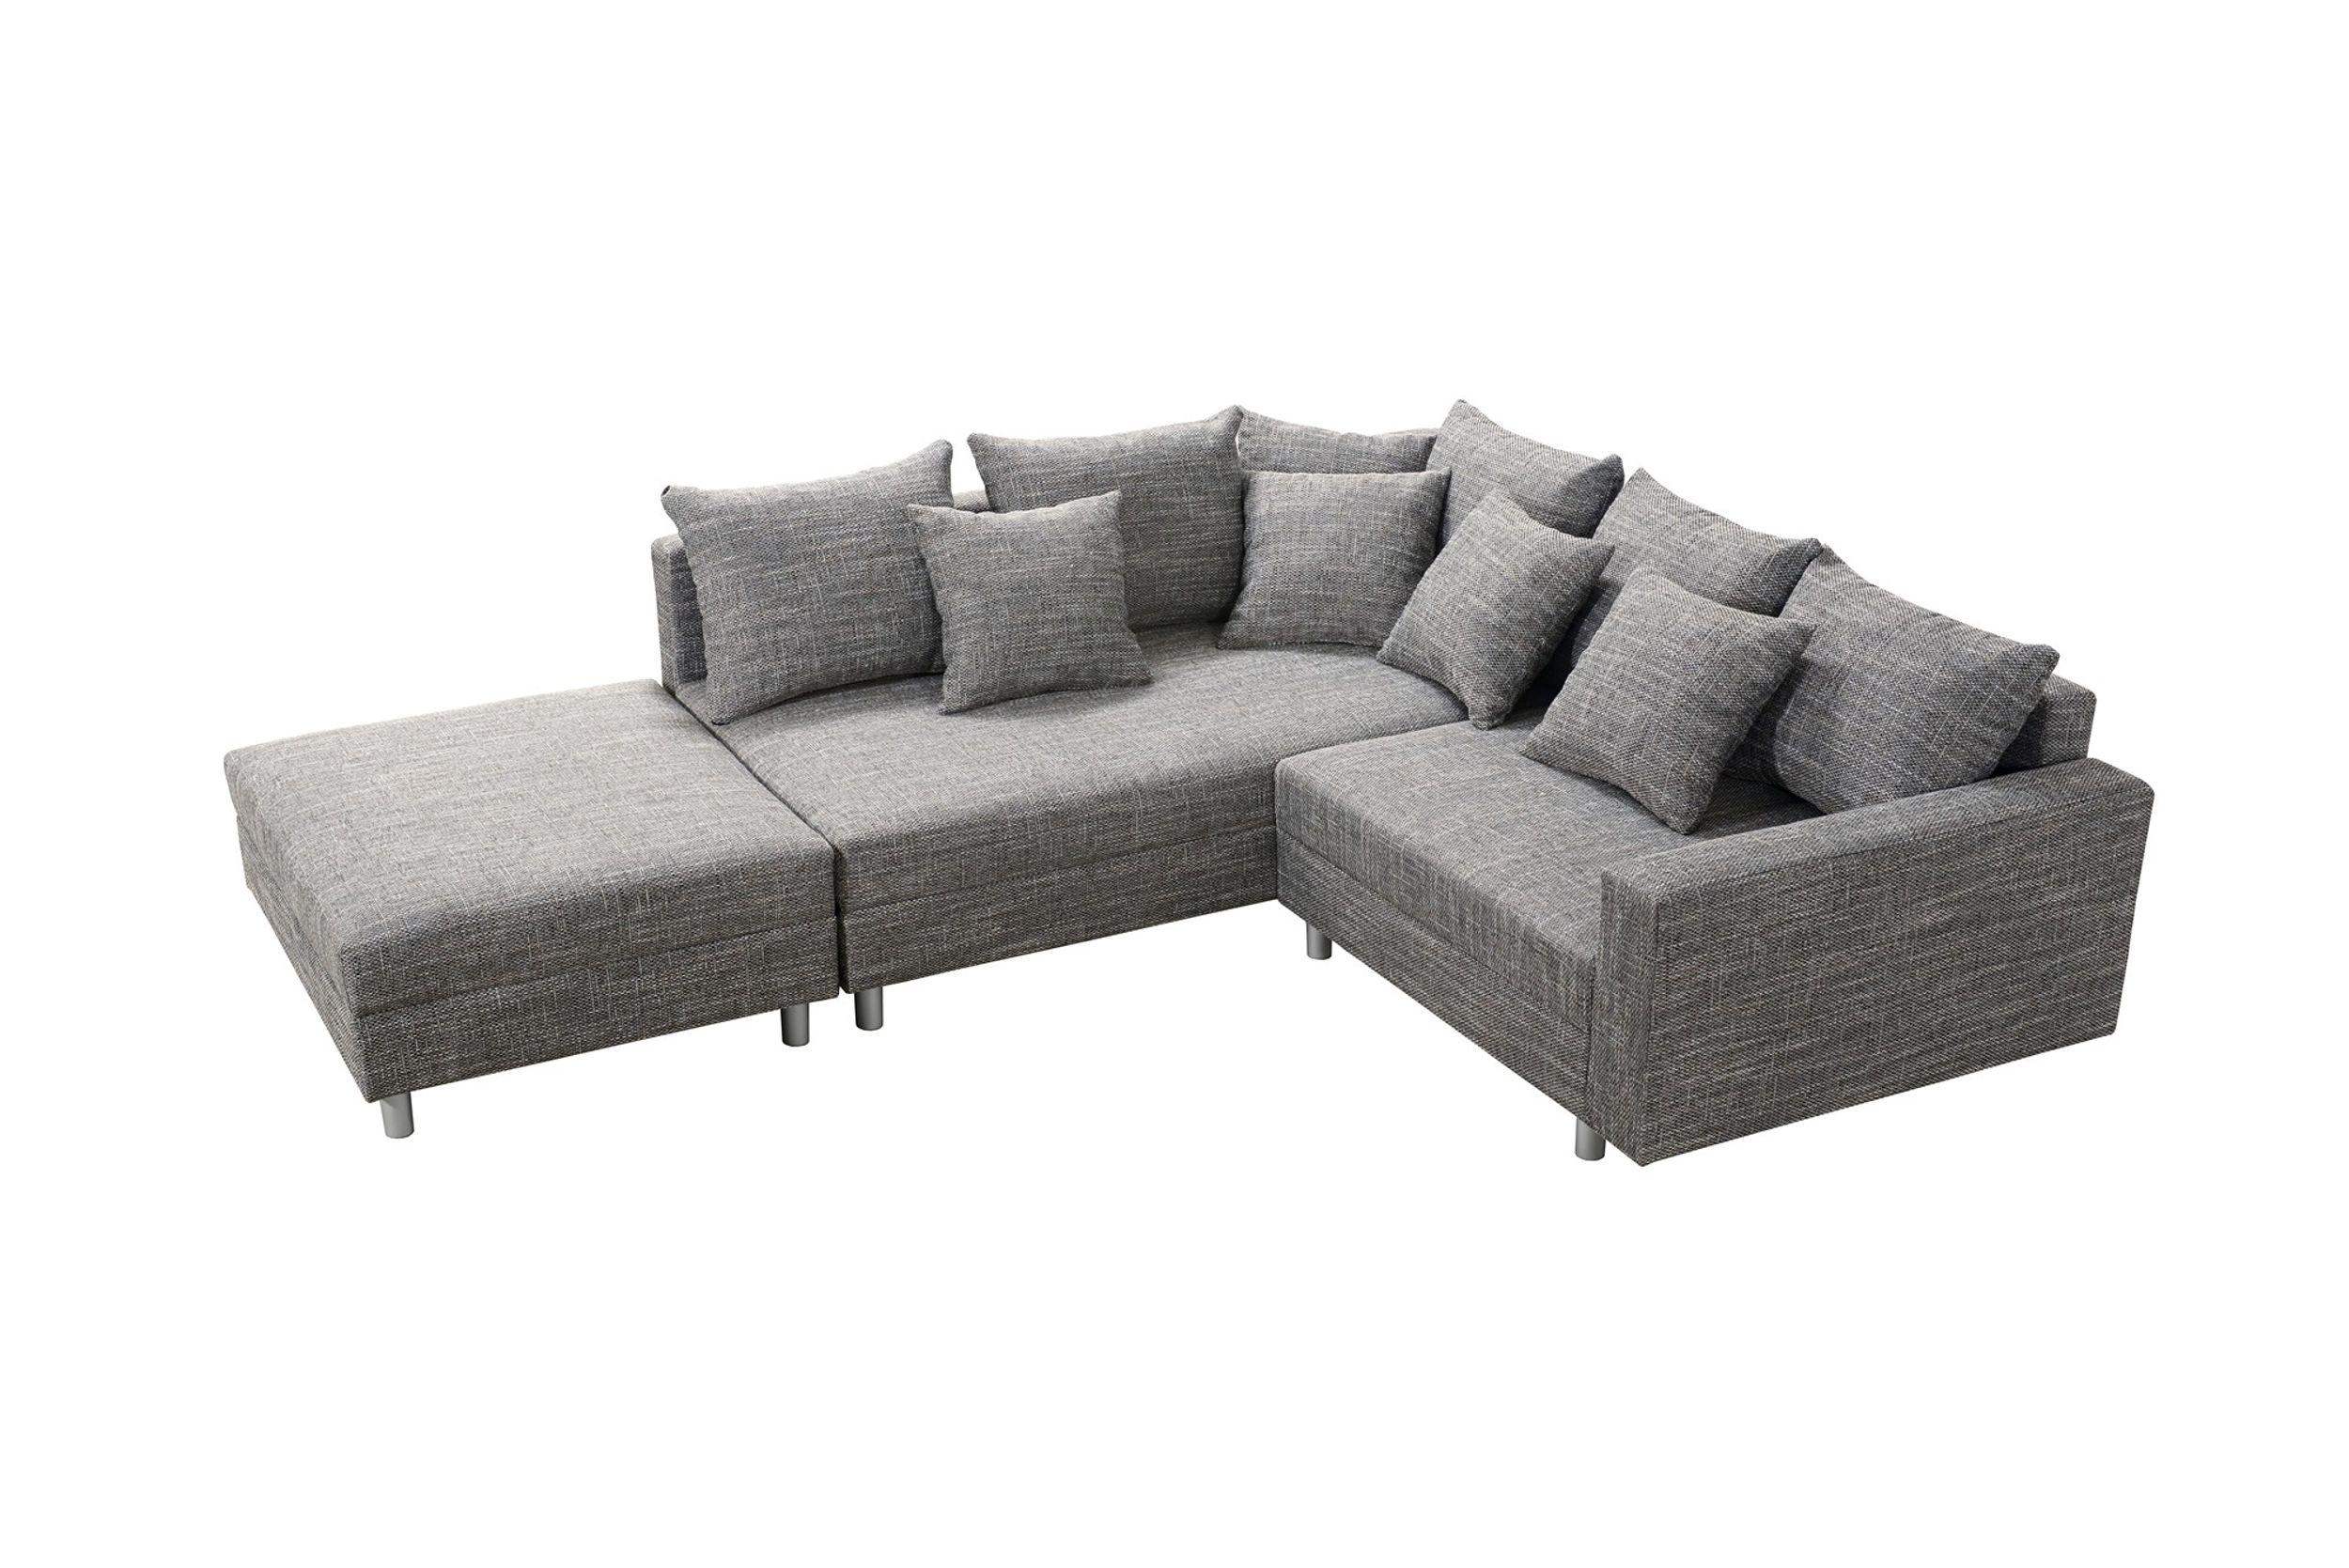 modernes sofa couch ecksofa eckcouch in gewebestoff hellgrau mit hocker minsk l polsterm bel sofa